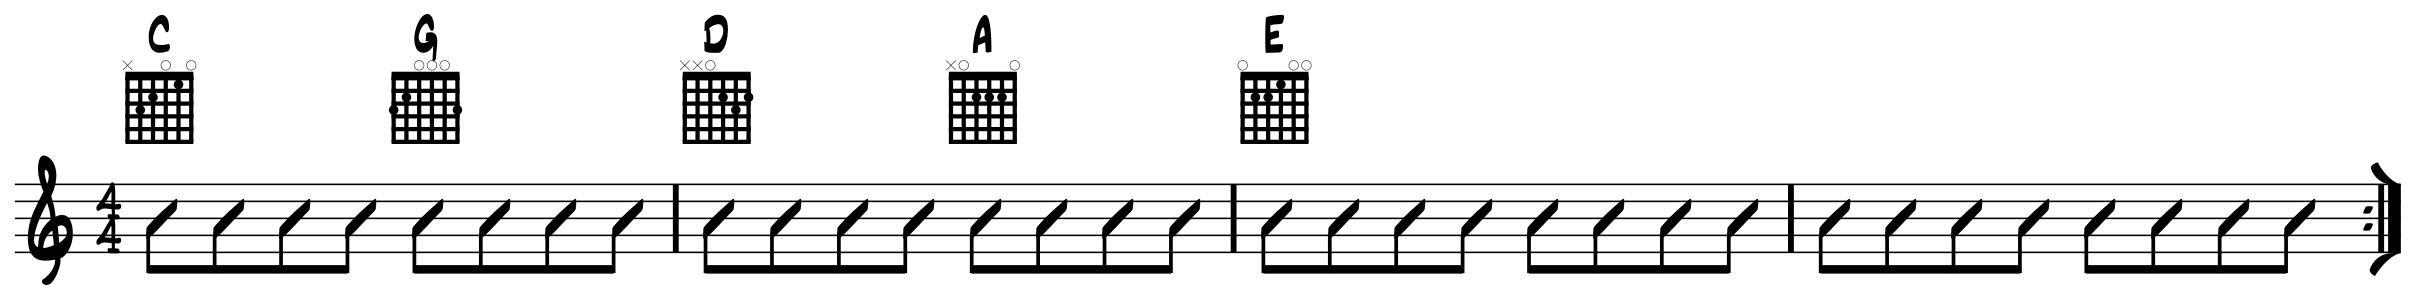 Hey Joe eighth notes